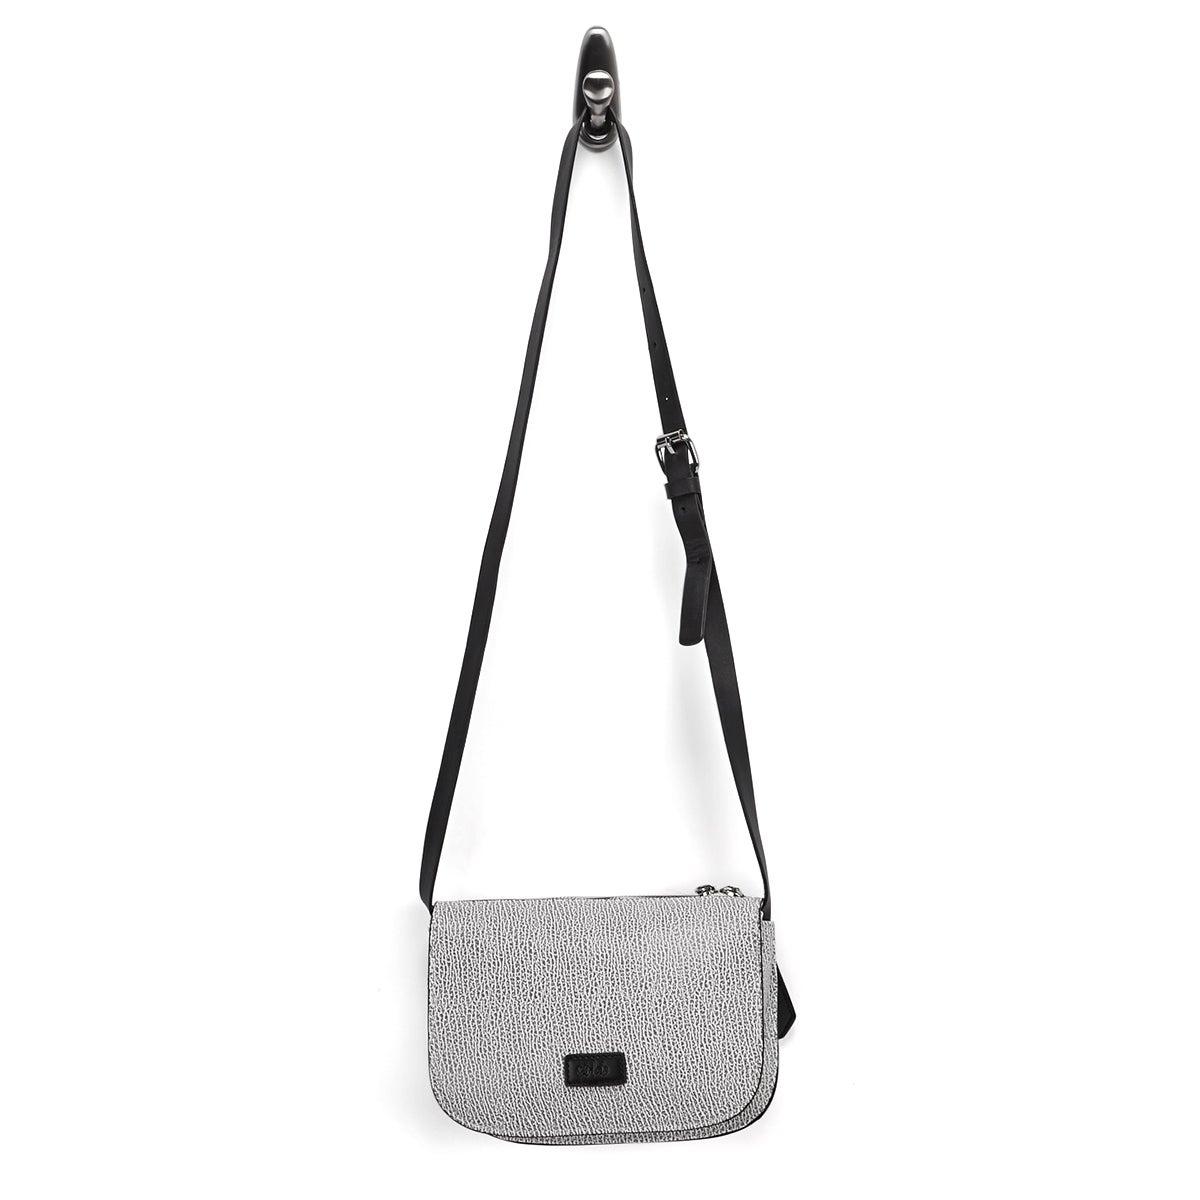 Lds Mini Saddle black/white cross body